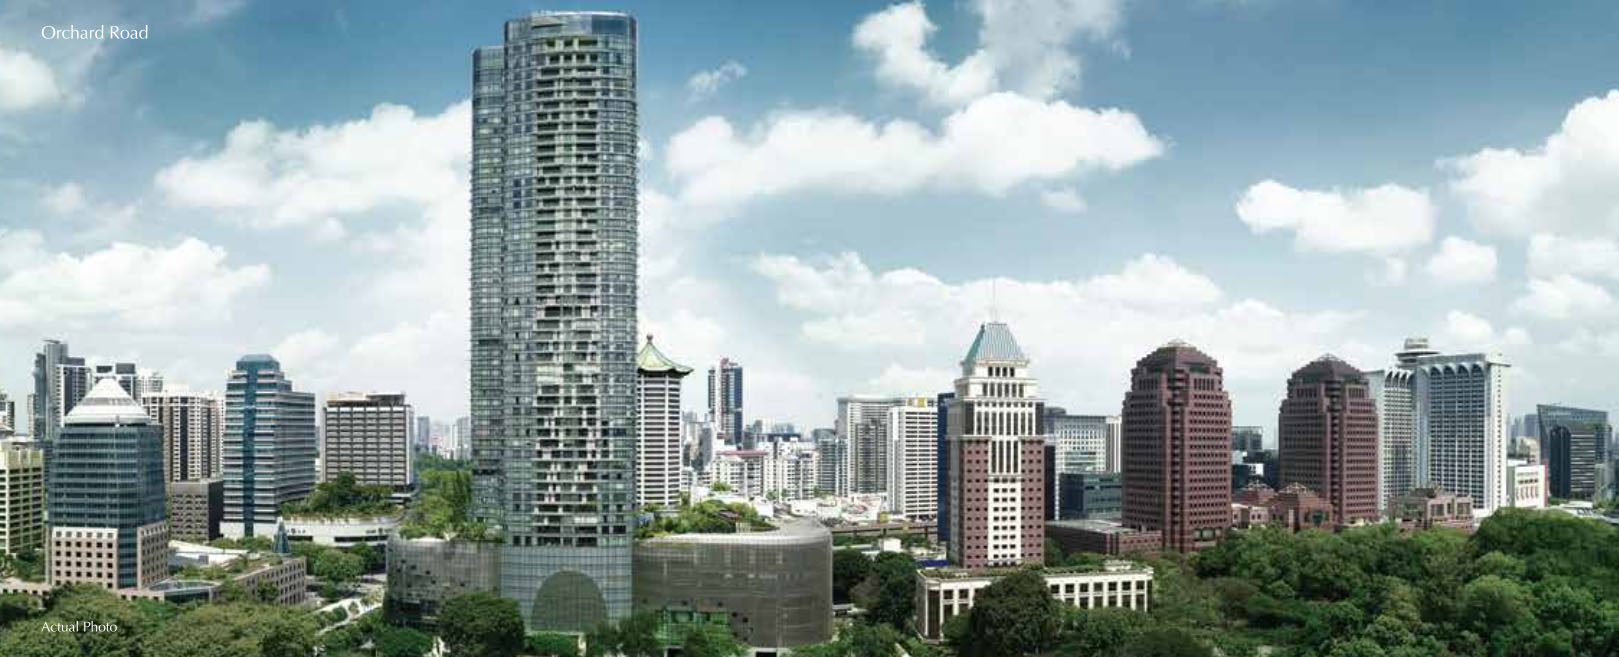 8 St Thomas View   SG Luxury Condo for Sale